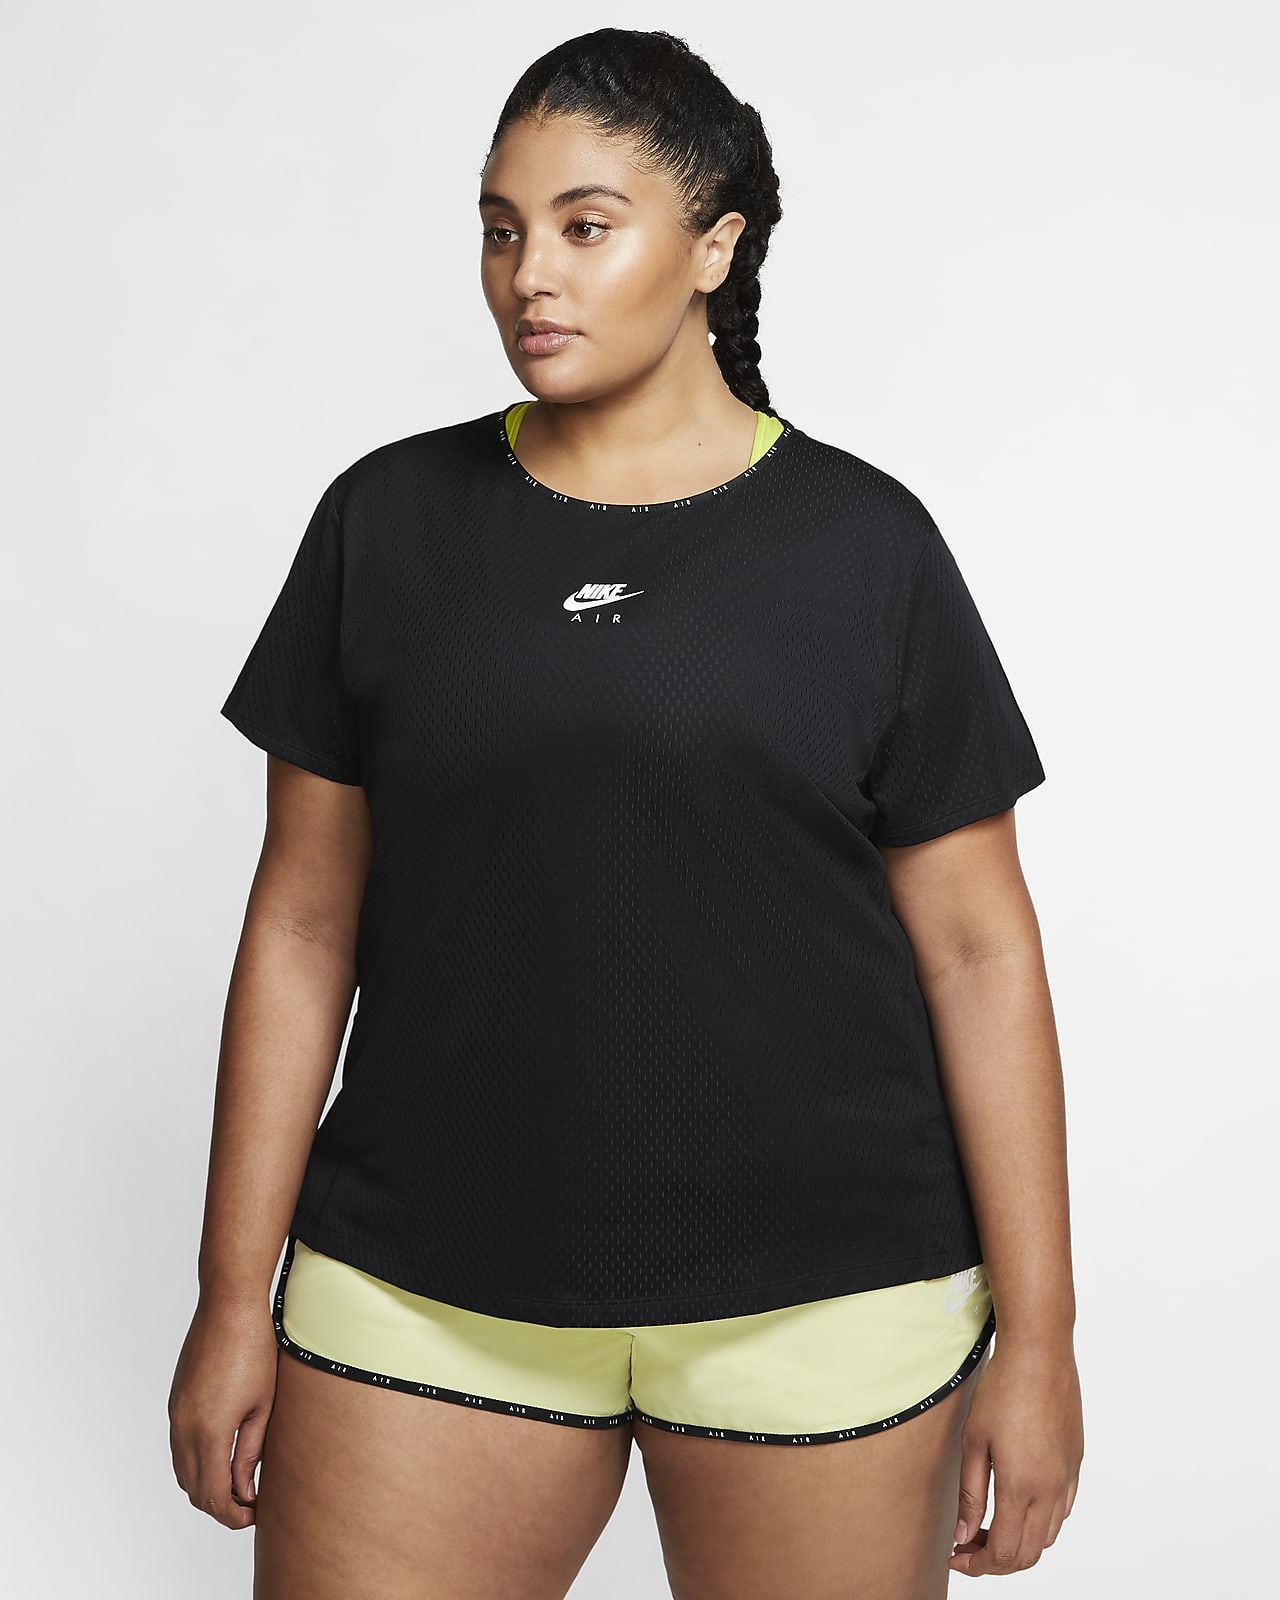 Haut de running Nike Air pour Femme (grande taille)